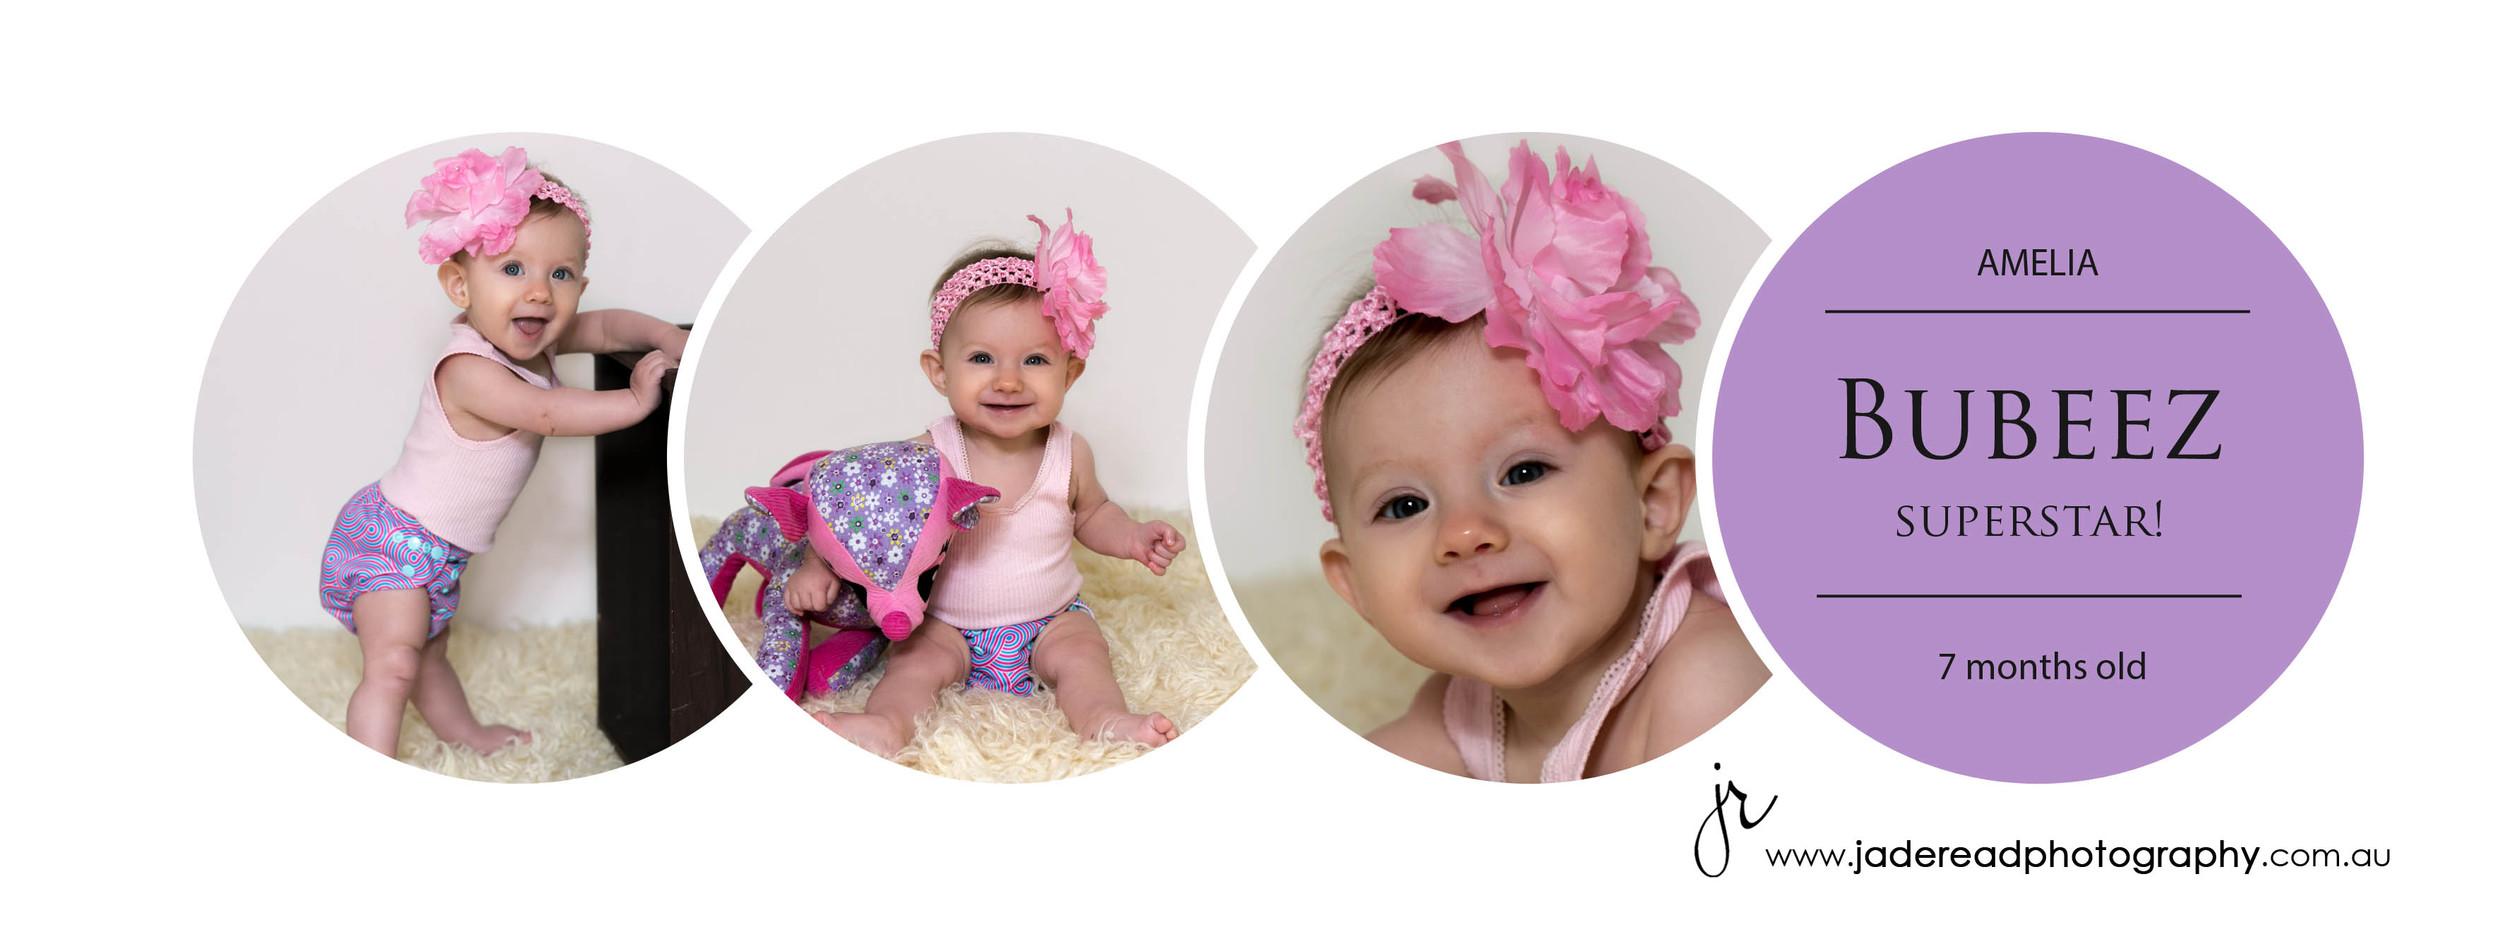 gold coast children's photographer baby photos family photos upper coomera benowa